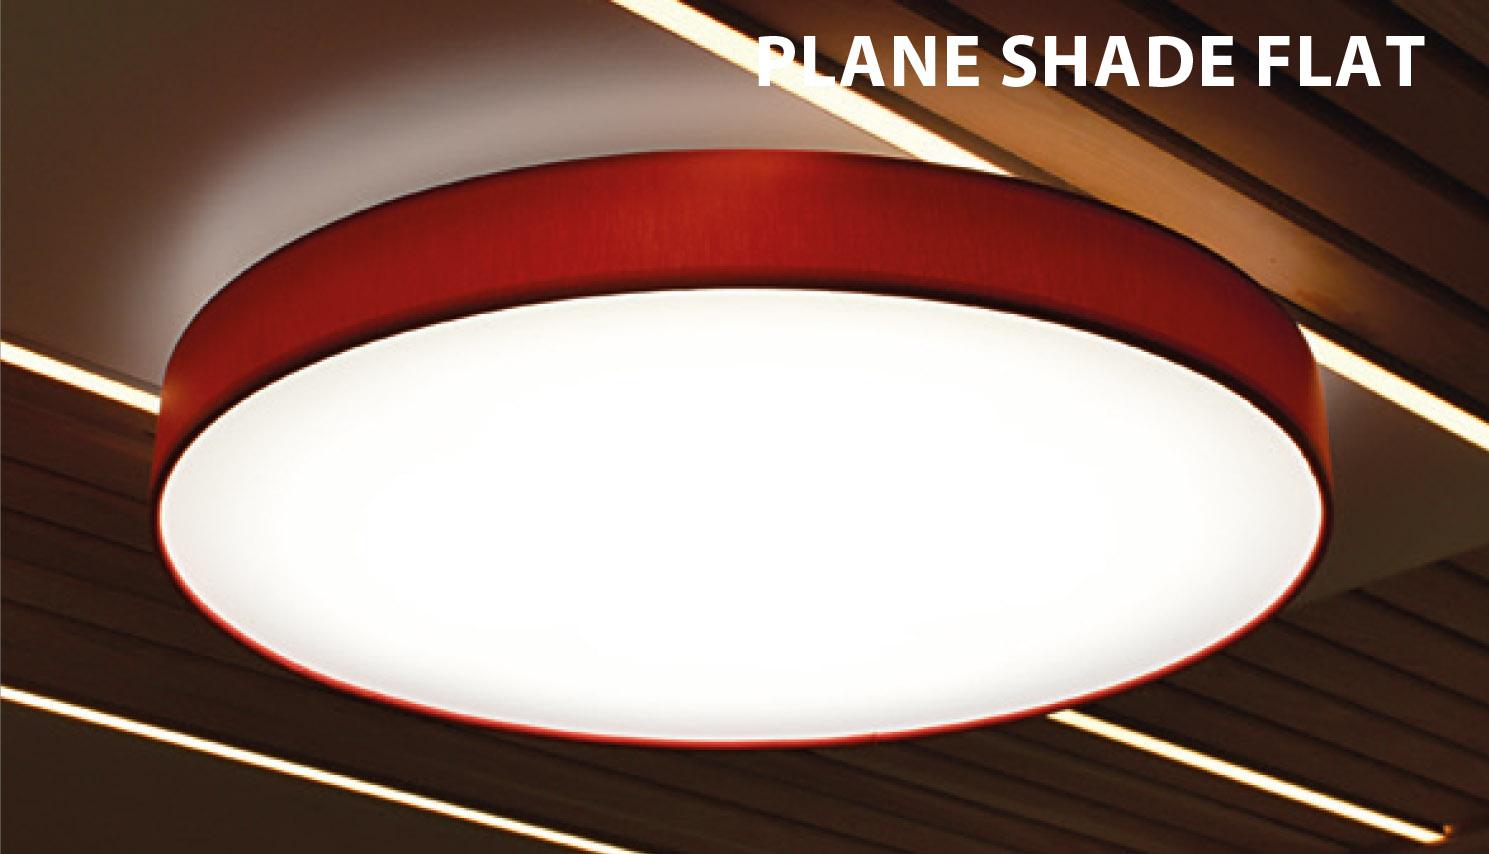 Plane Shade Flat